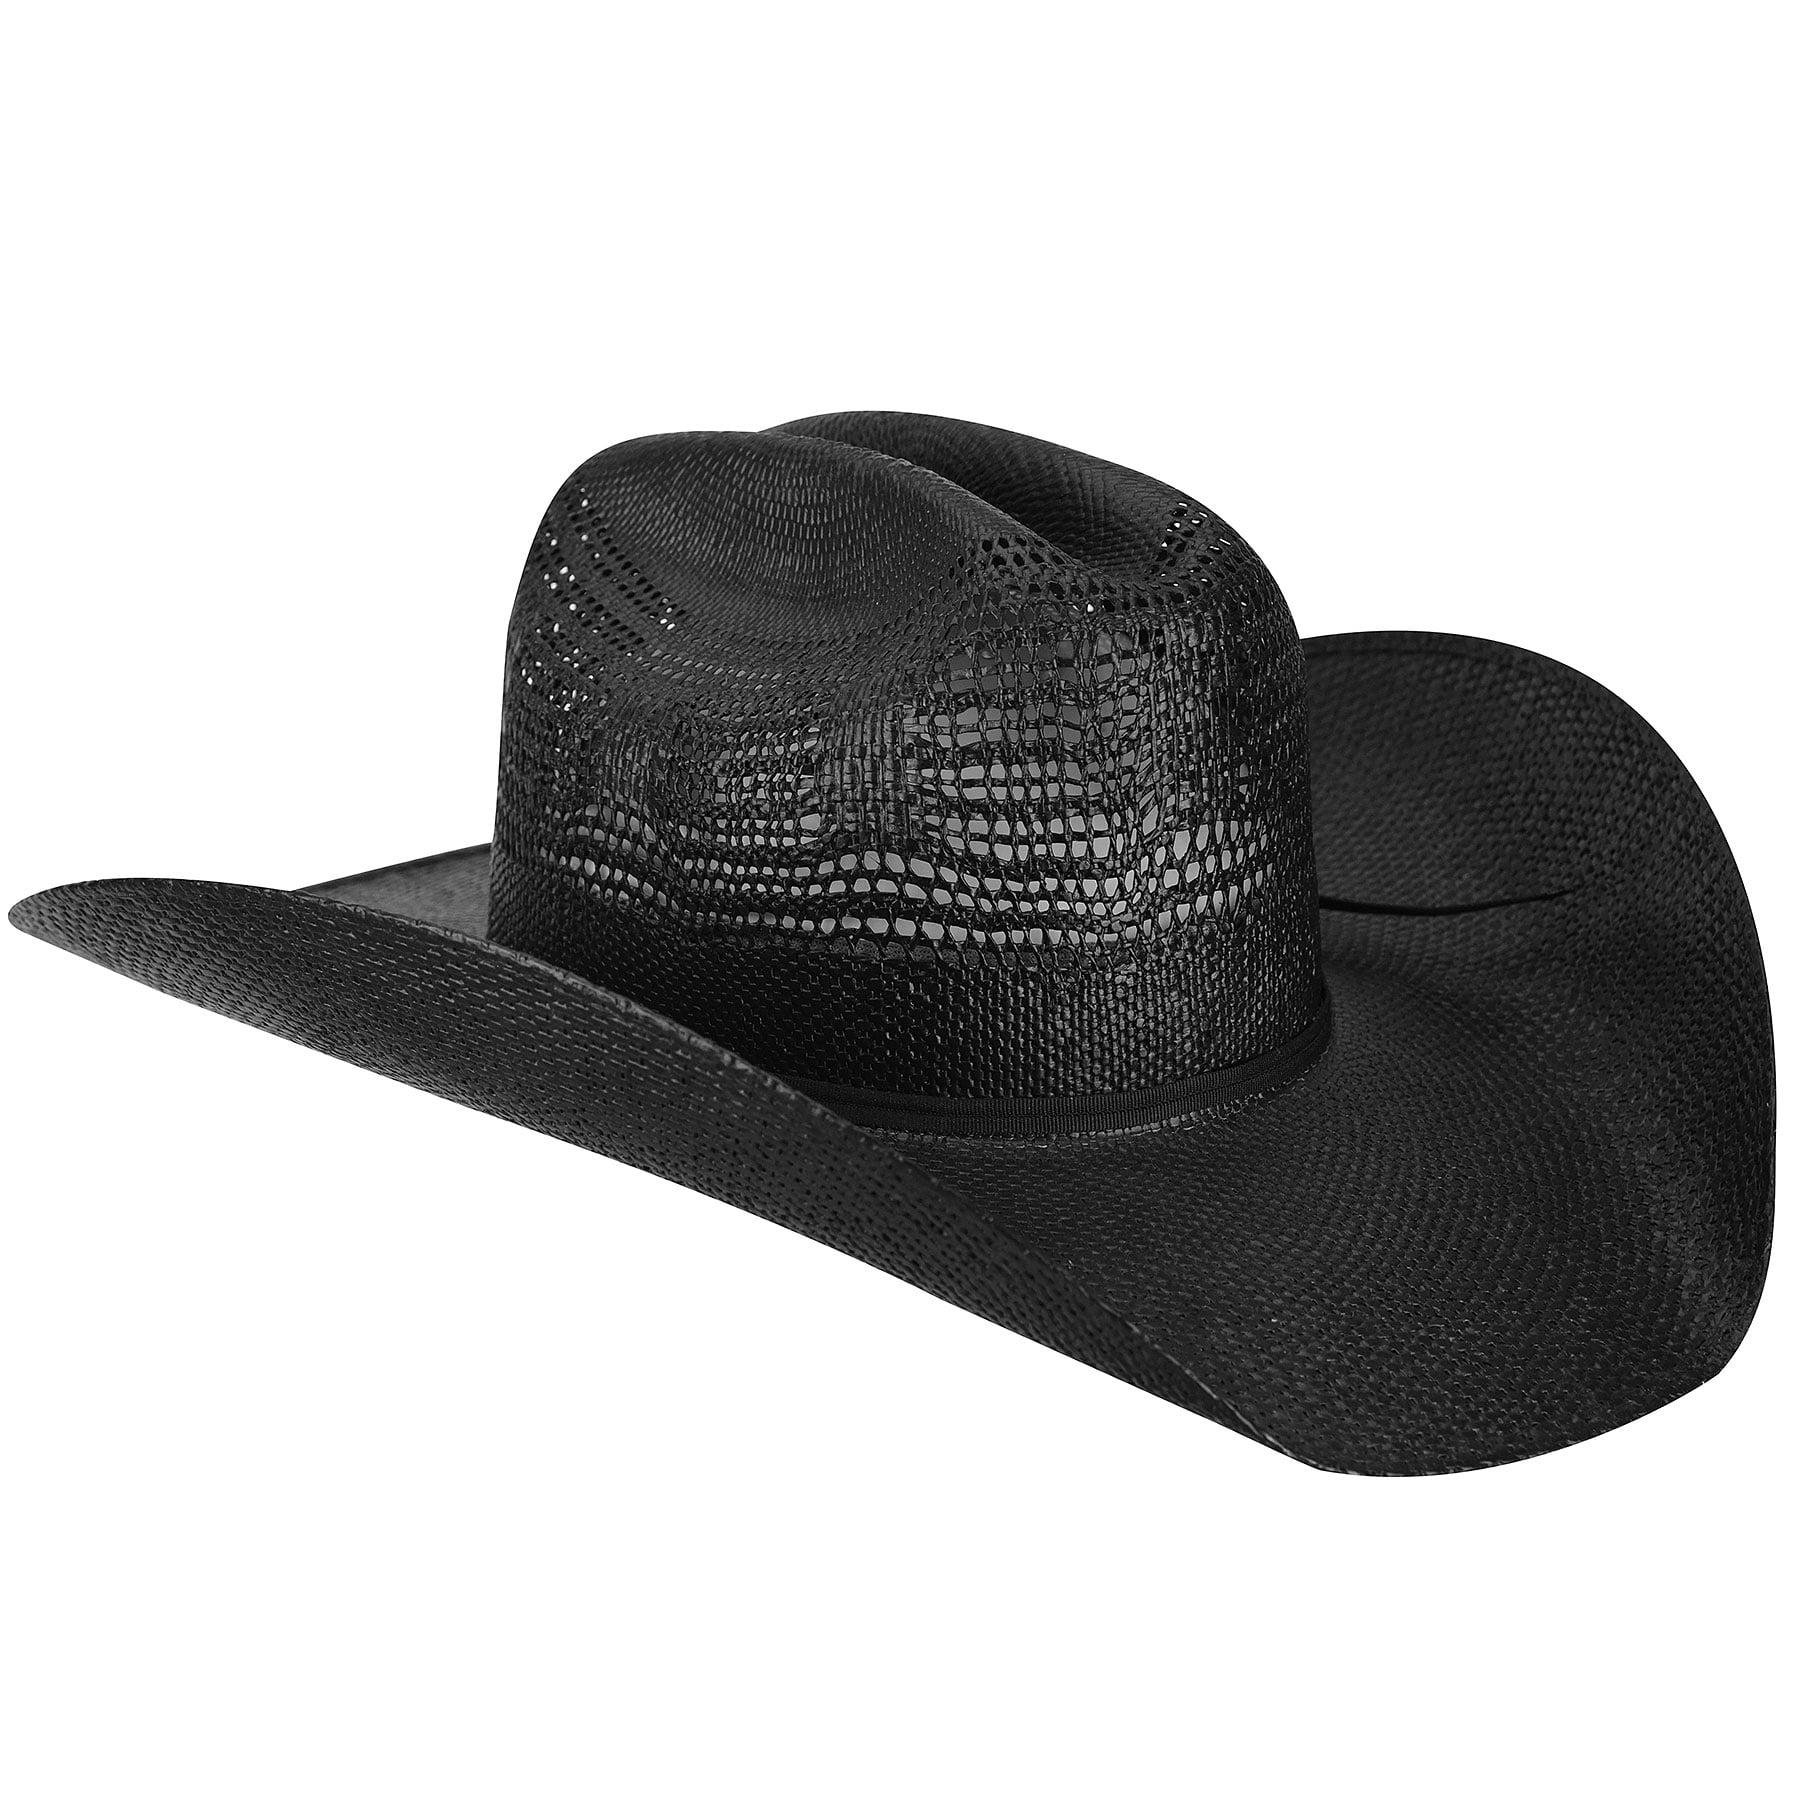 a1a4a978c8726 Bailey Western Men Desert Knight Western Hat - Walmart.com